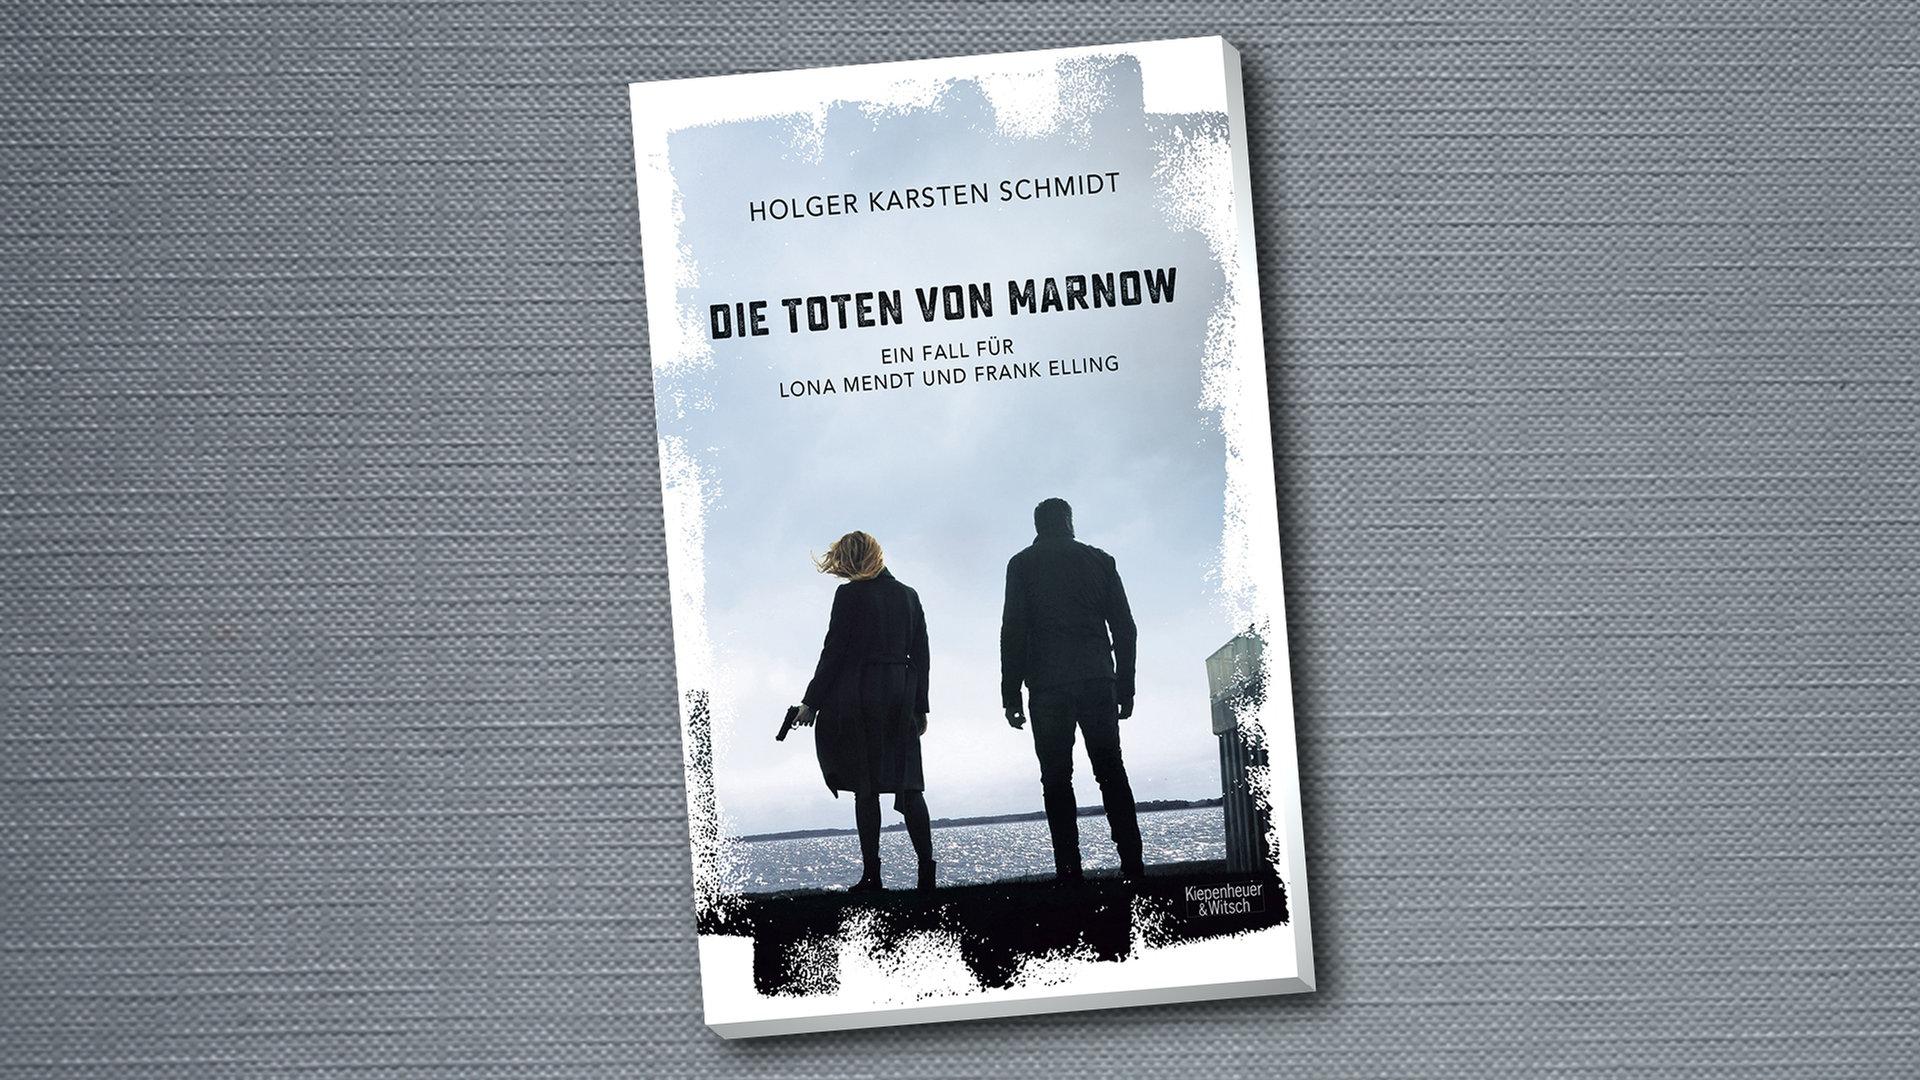 Ndr Buch Des Monats Die Toten Von Marnow Ndr De Kultur Buch Buch Des Monats